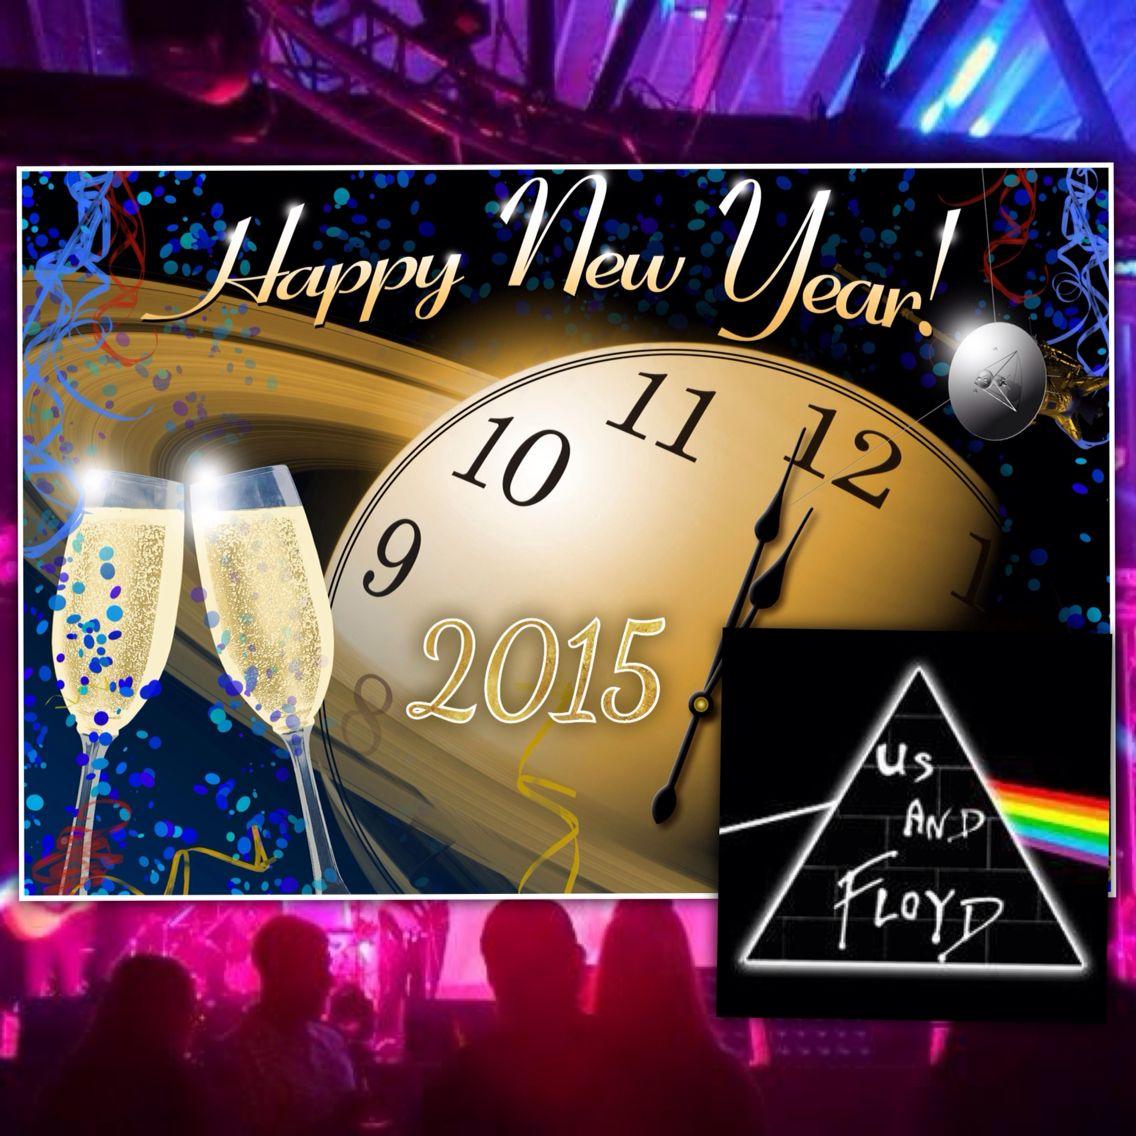 Happy New Year Pink Floyd Fans! Pink floyd fan, Pink